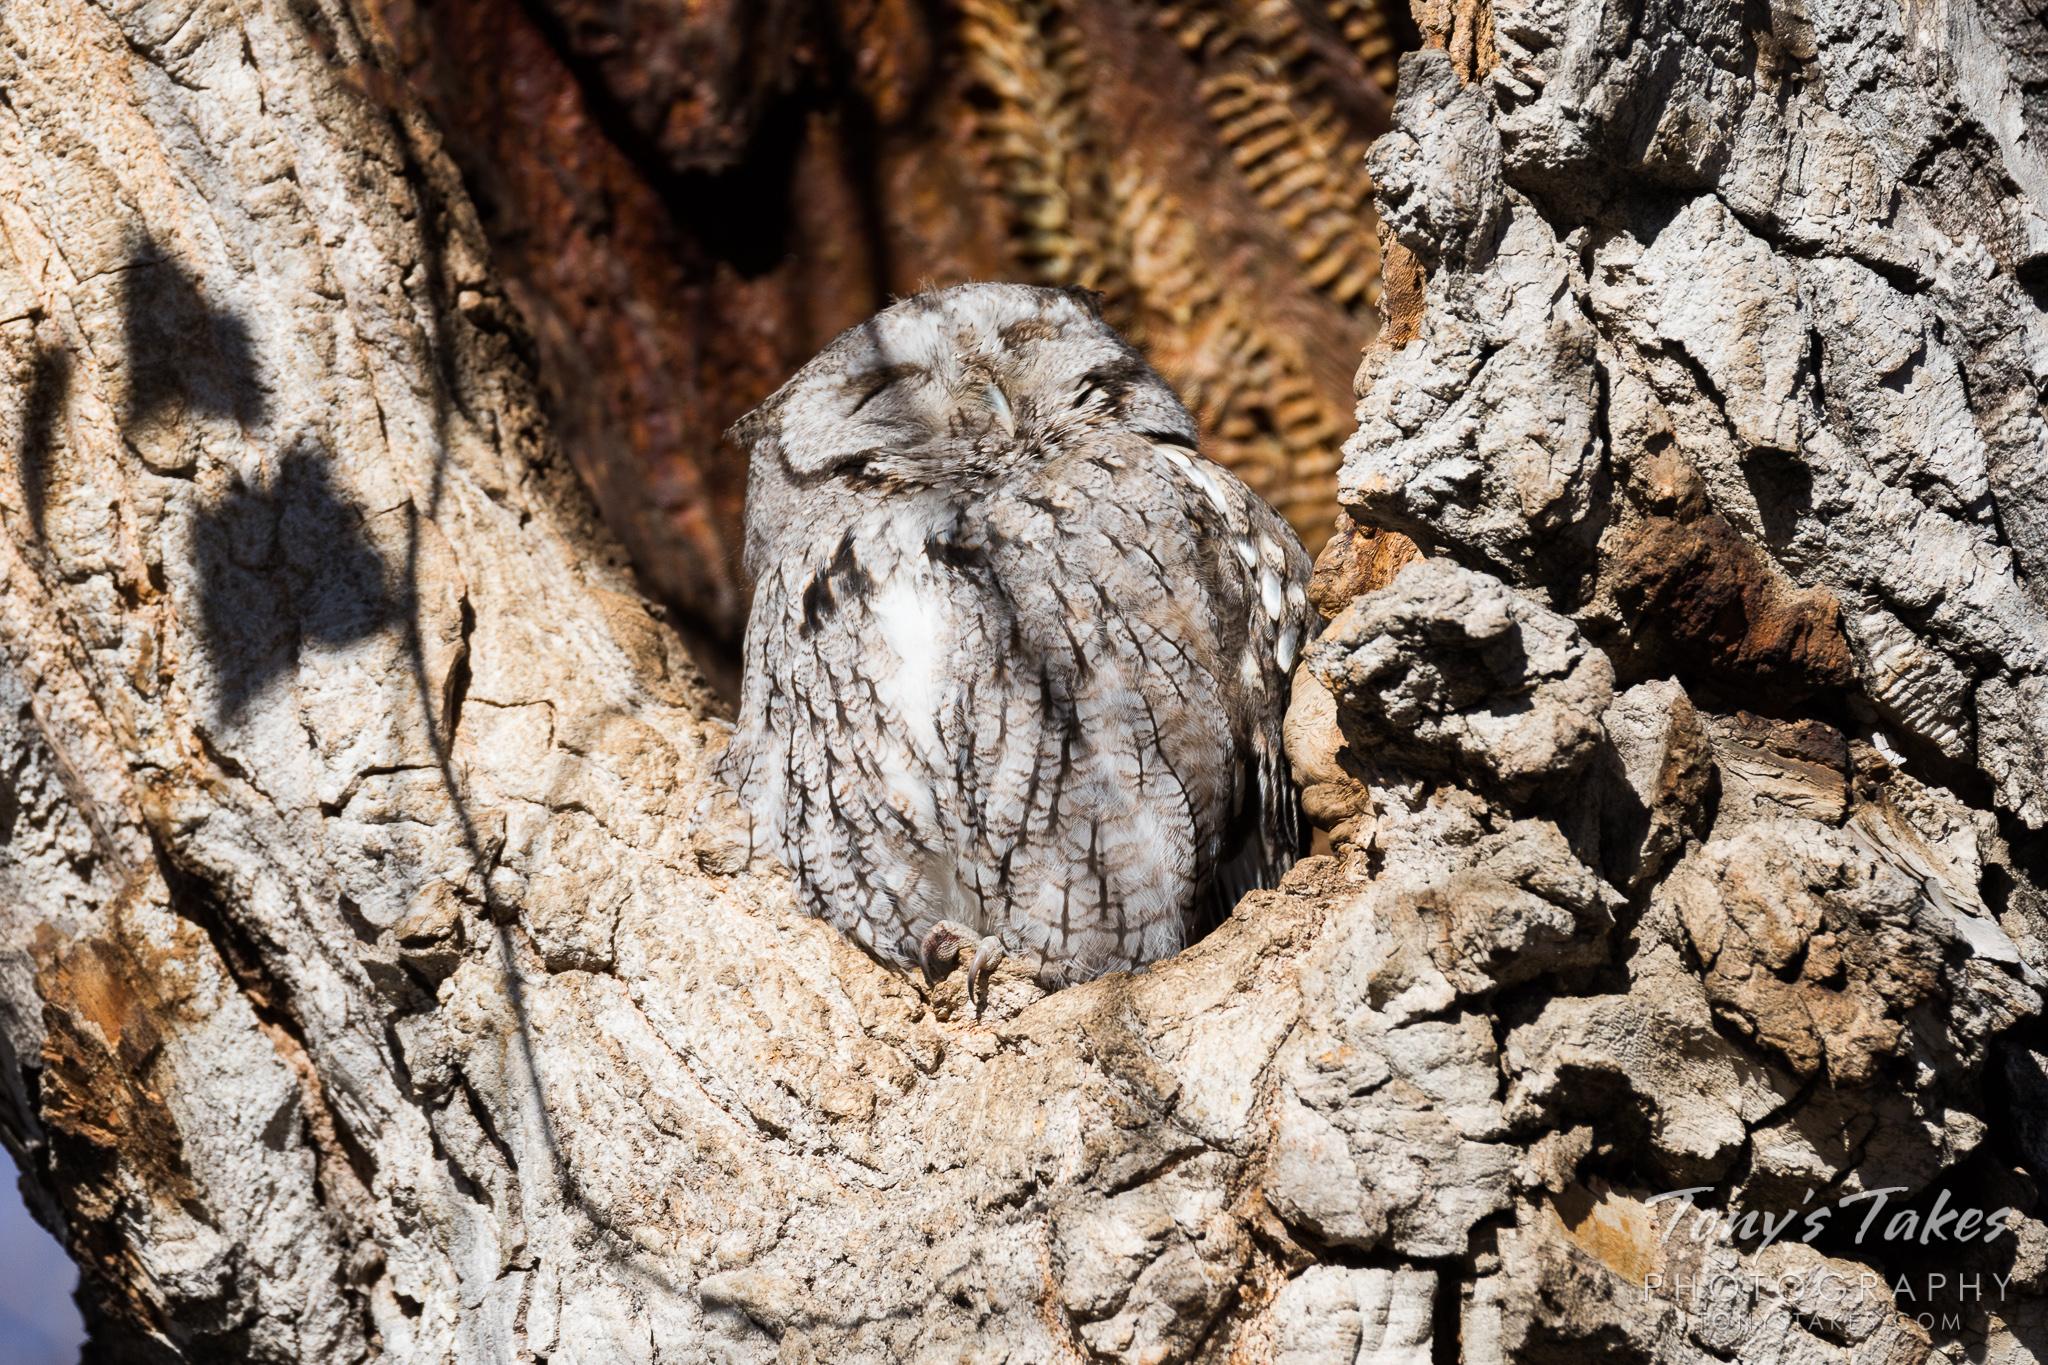 An Eastern Screech Owl soaks in the sun near Denver, Colorado. © Tony's Takes